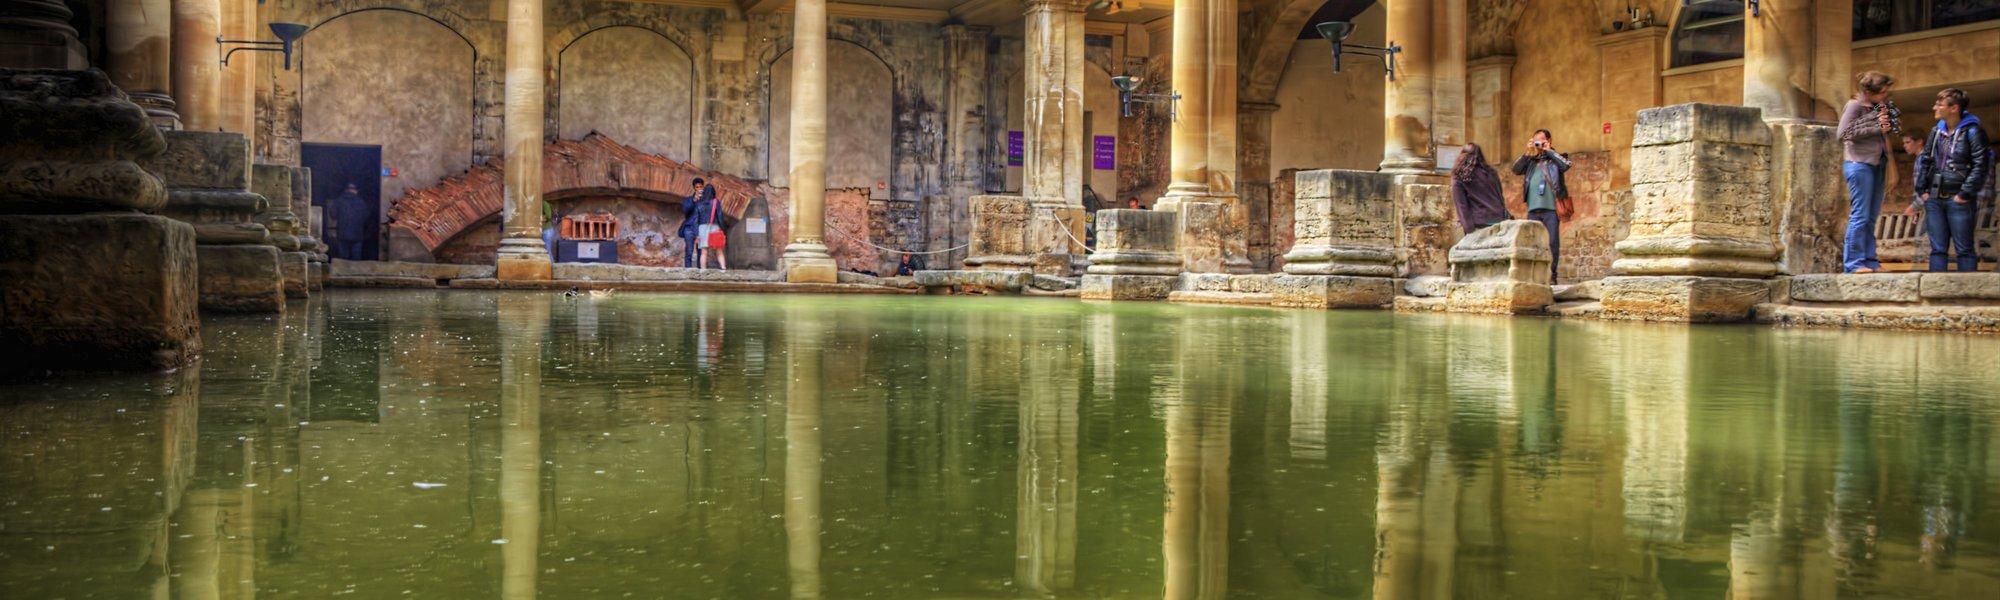 Bath Heritage Services